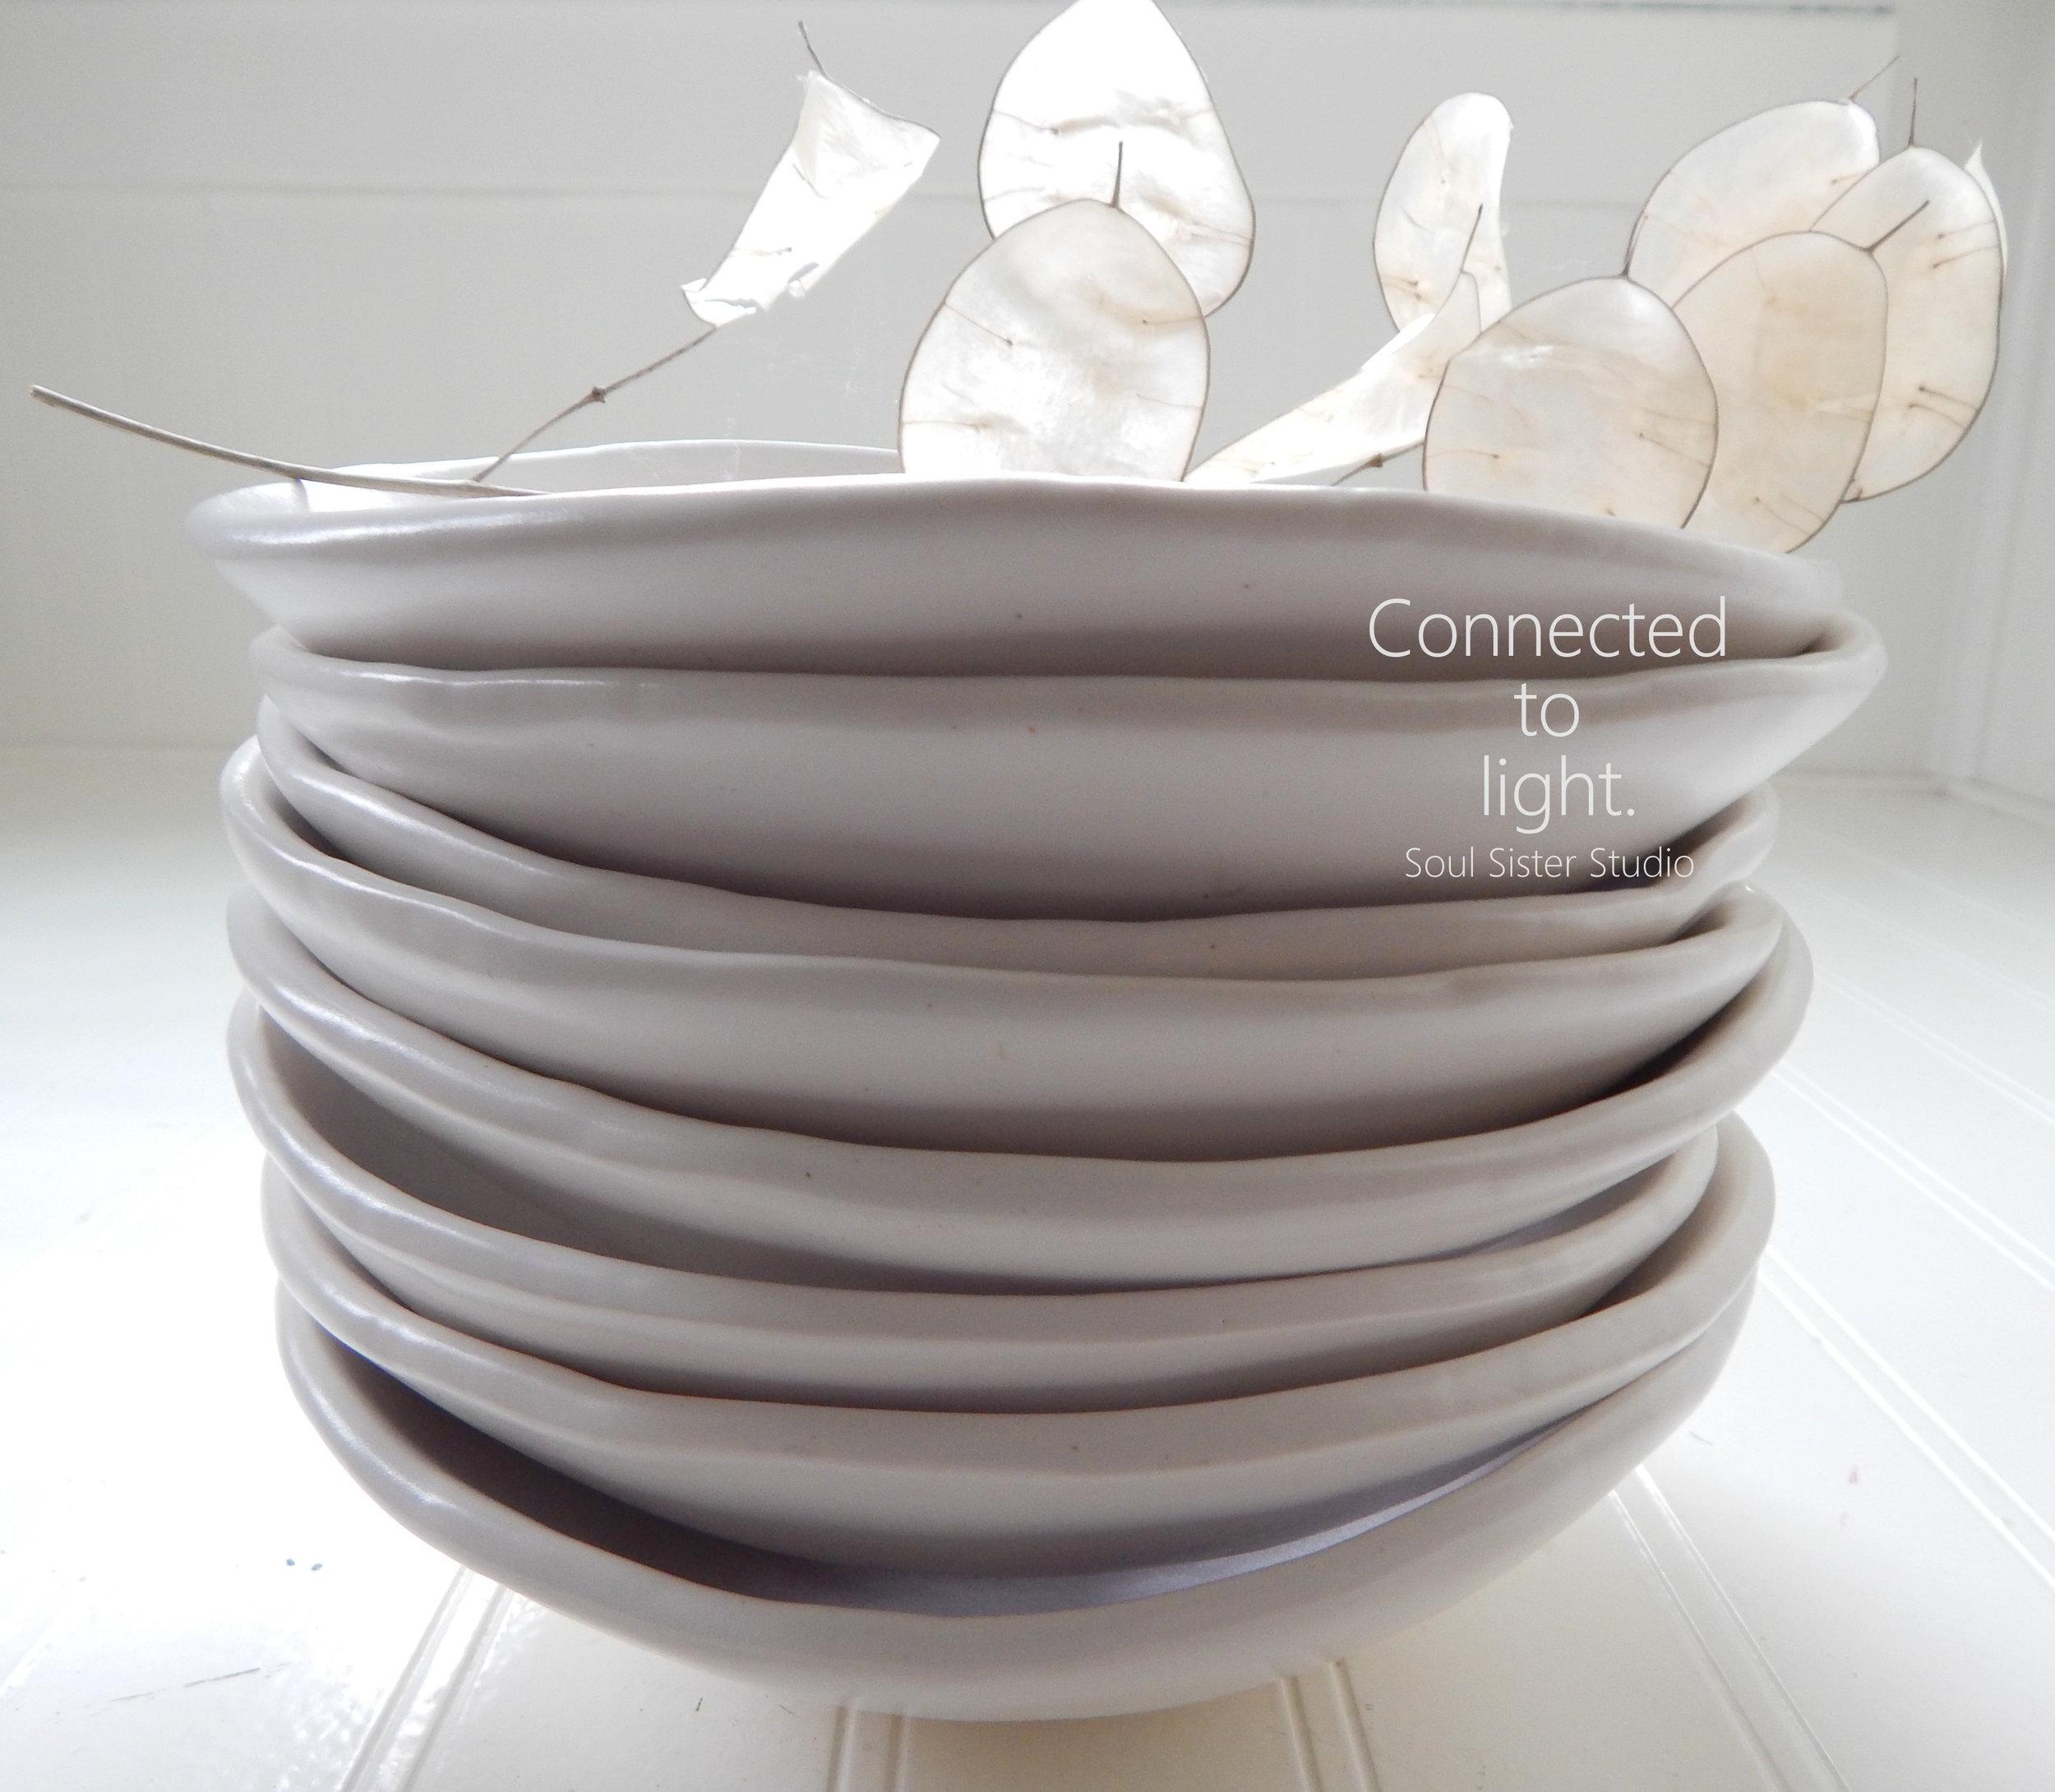 PotteryWhiteBowlConnected2.jpg